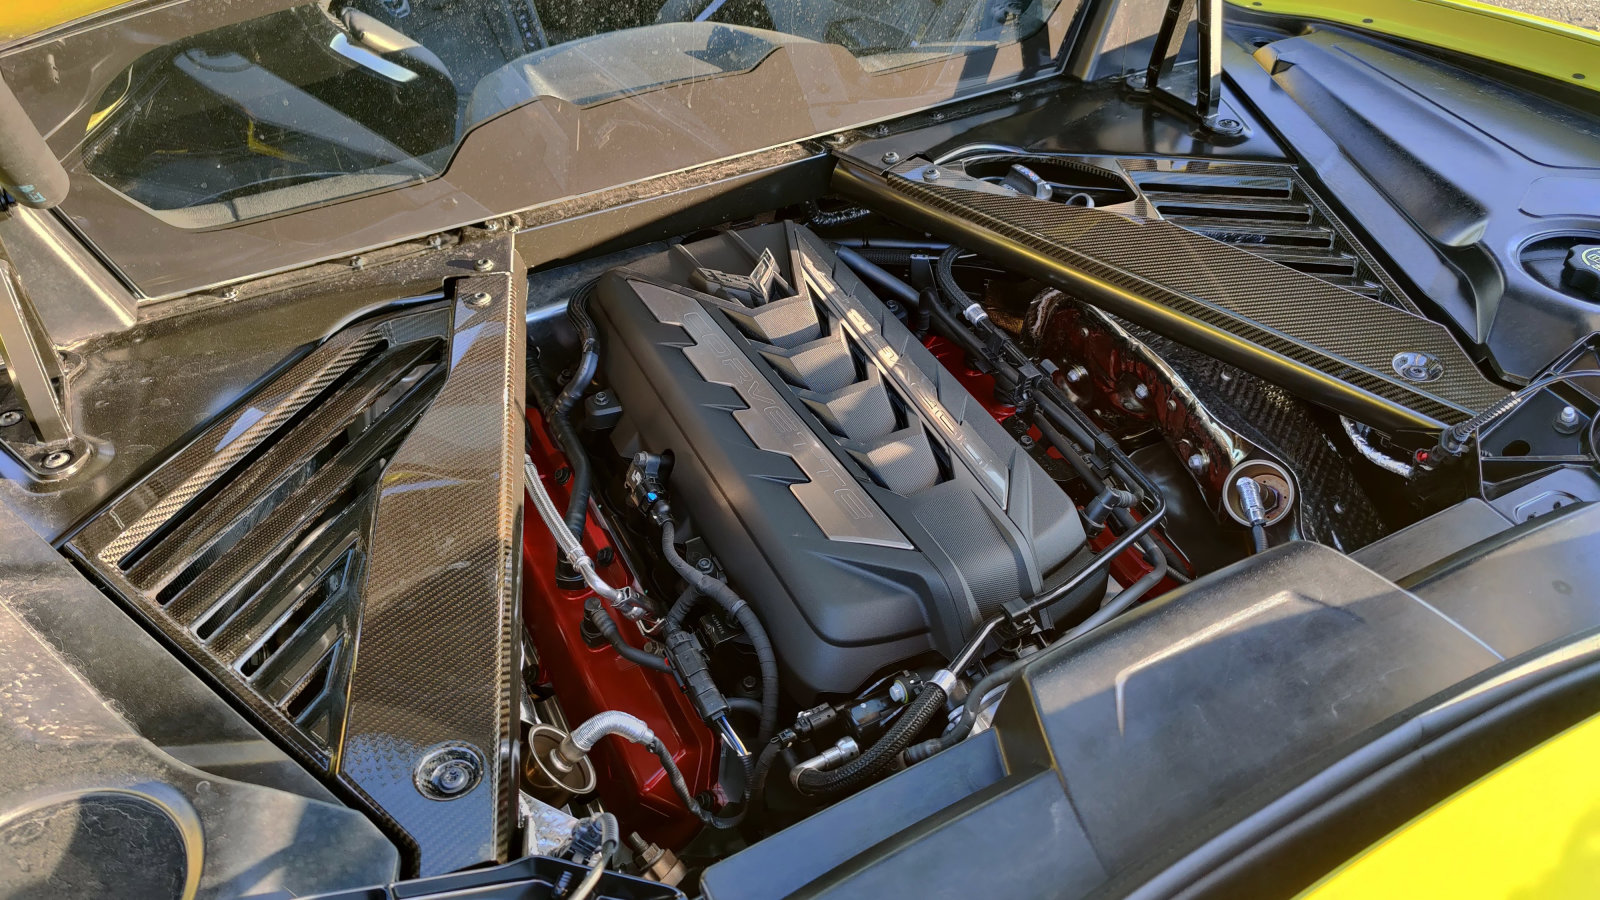 2020 Chevrolet Corvette Practice Run|Video clip, perceptions, images